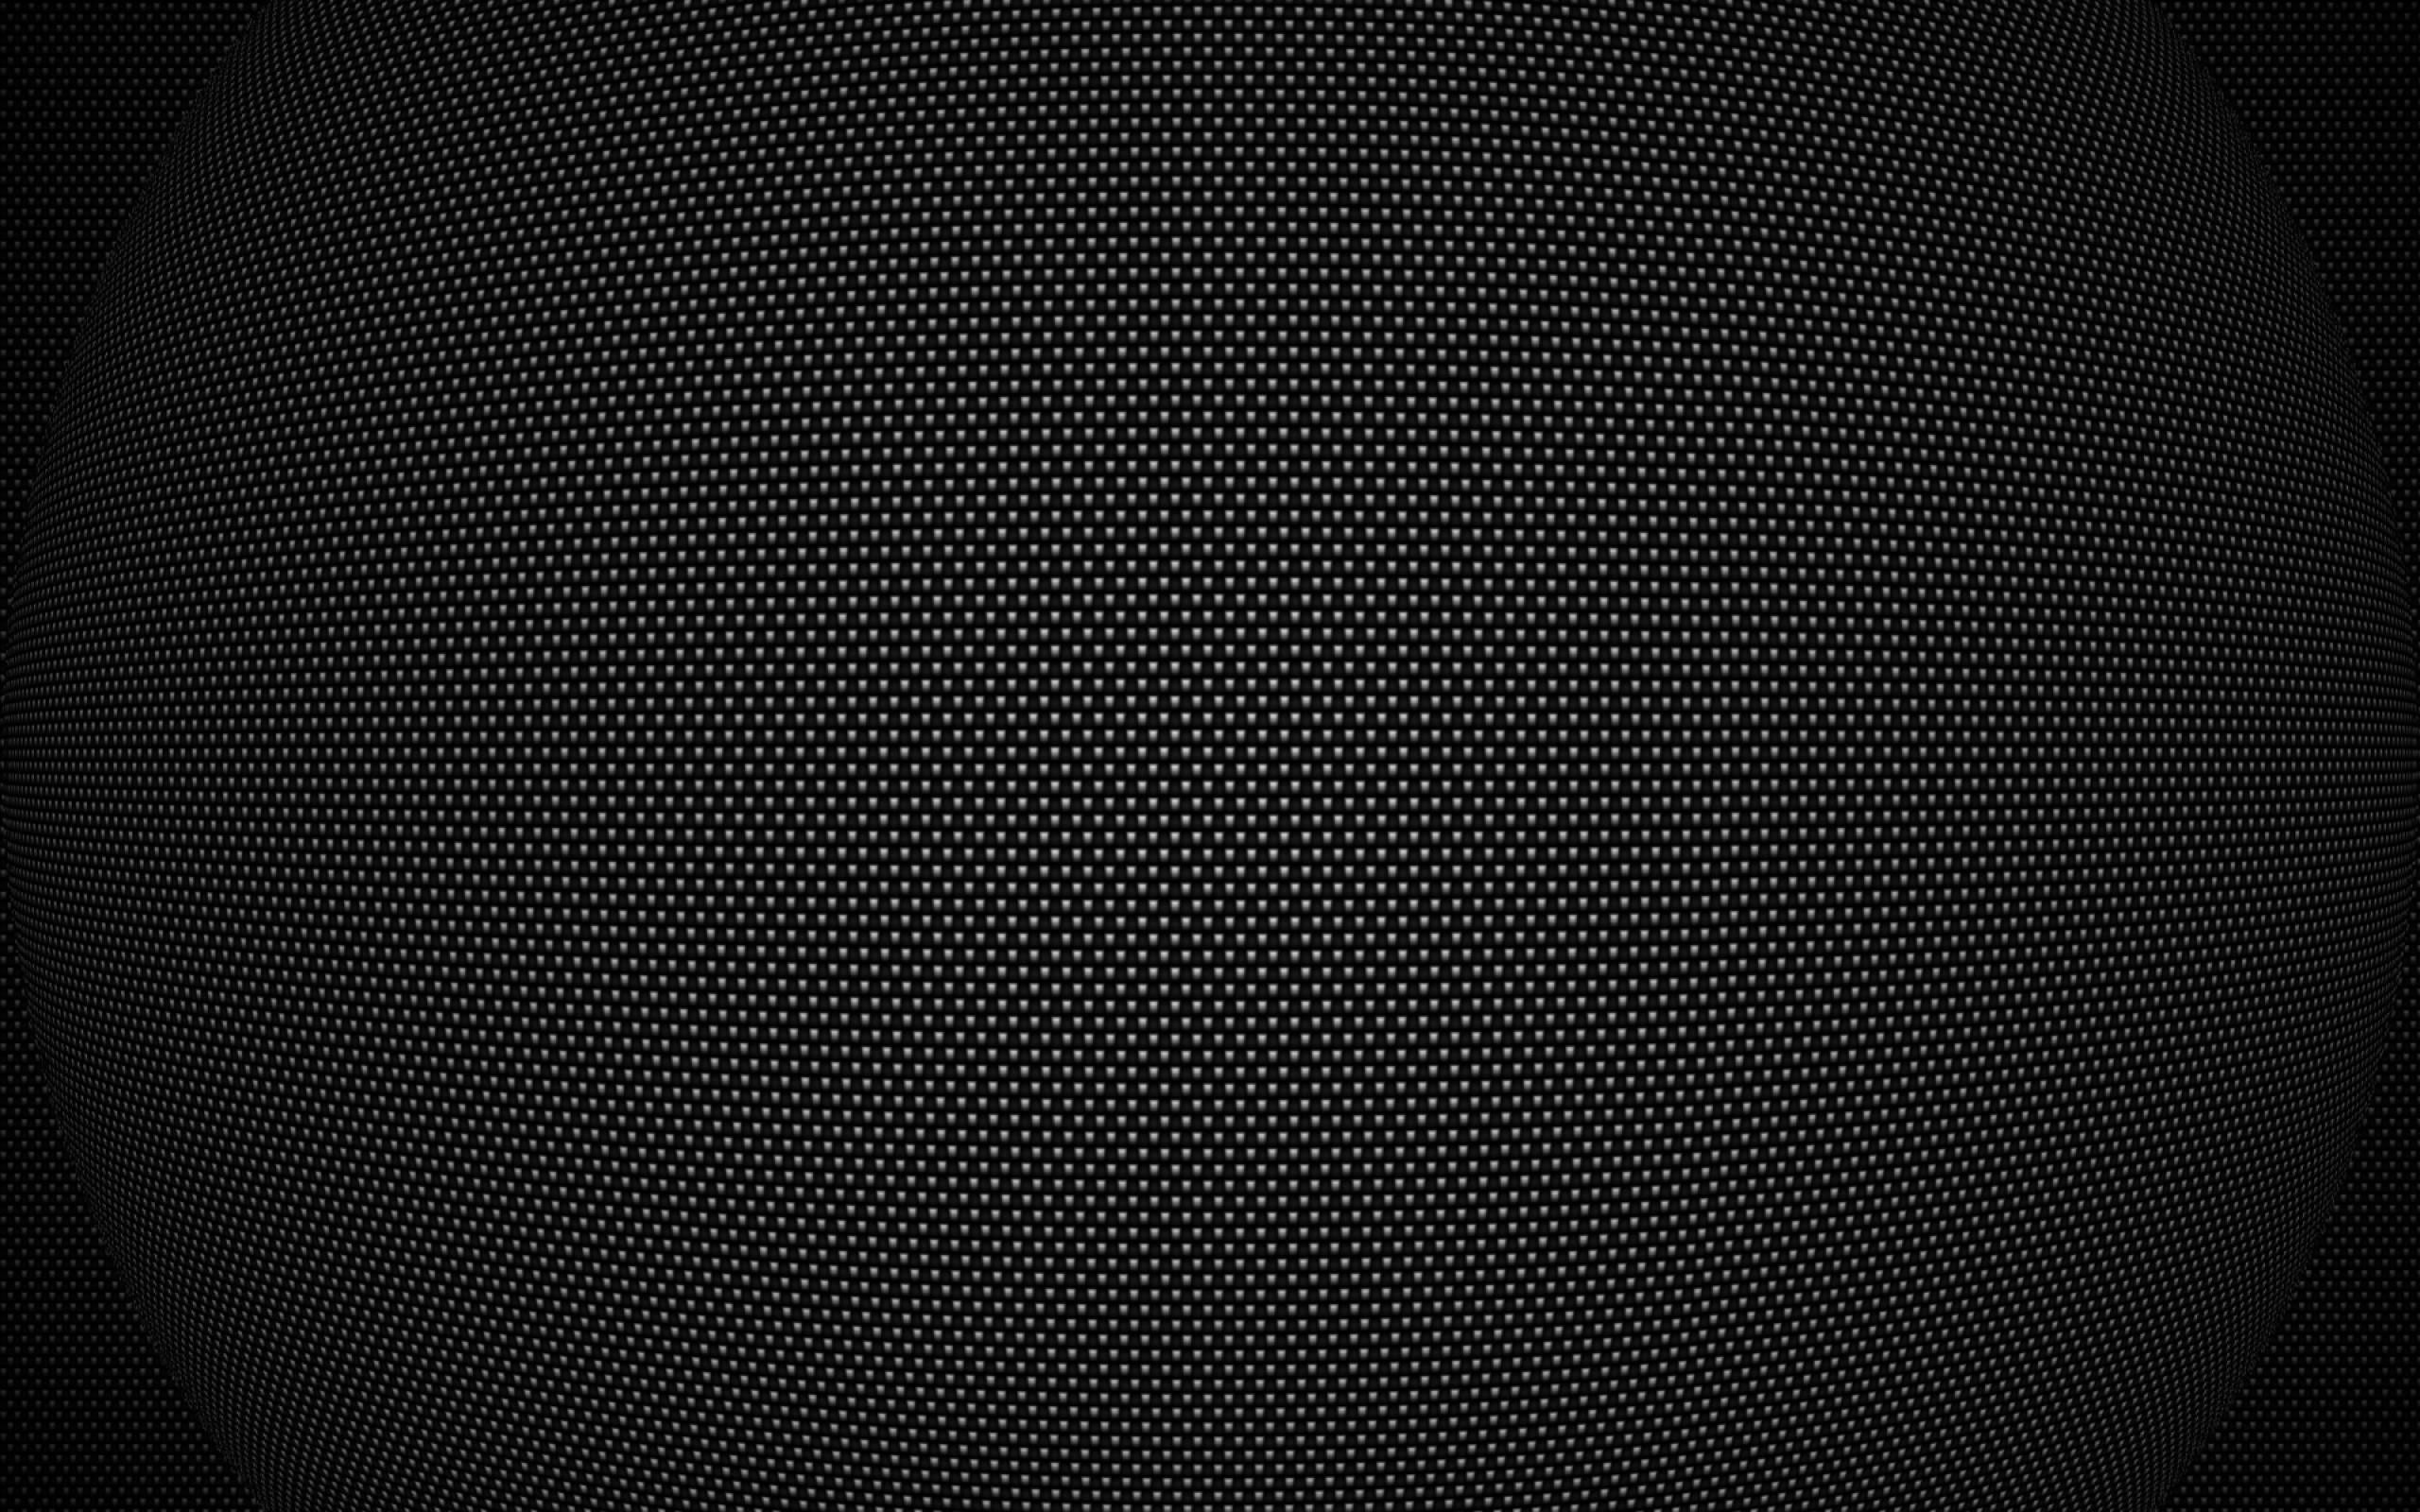 Black Texture Wallpaper Noname Textured